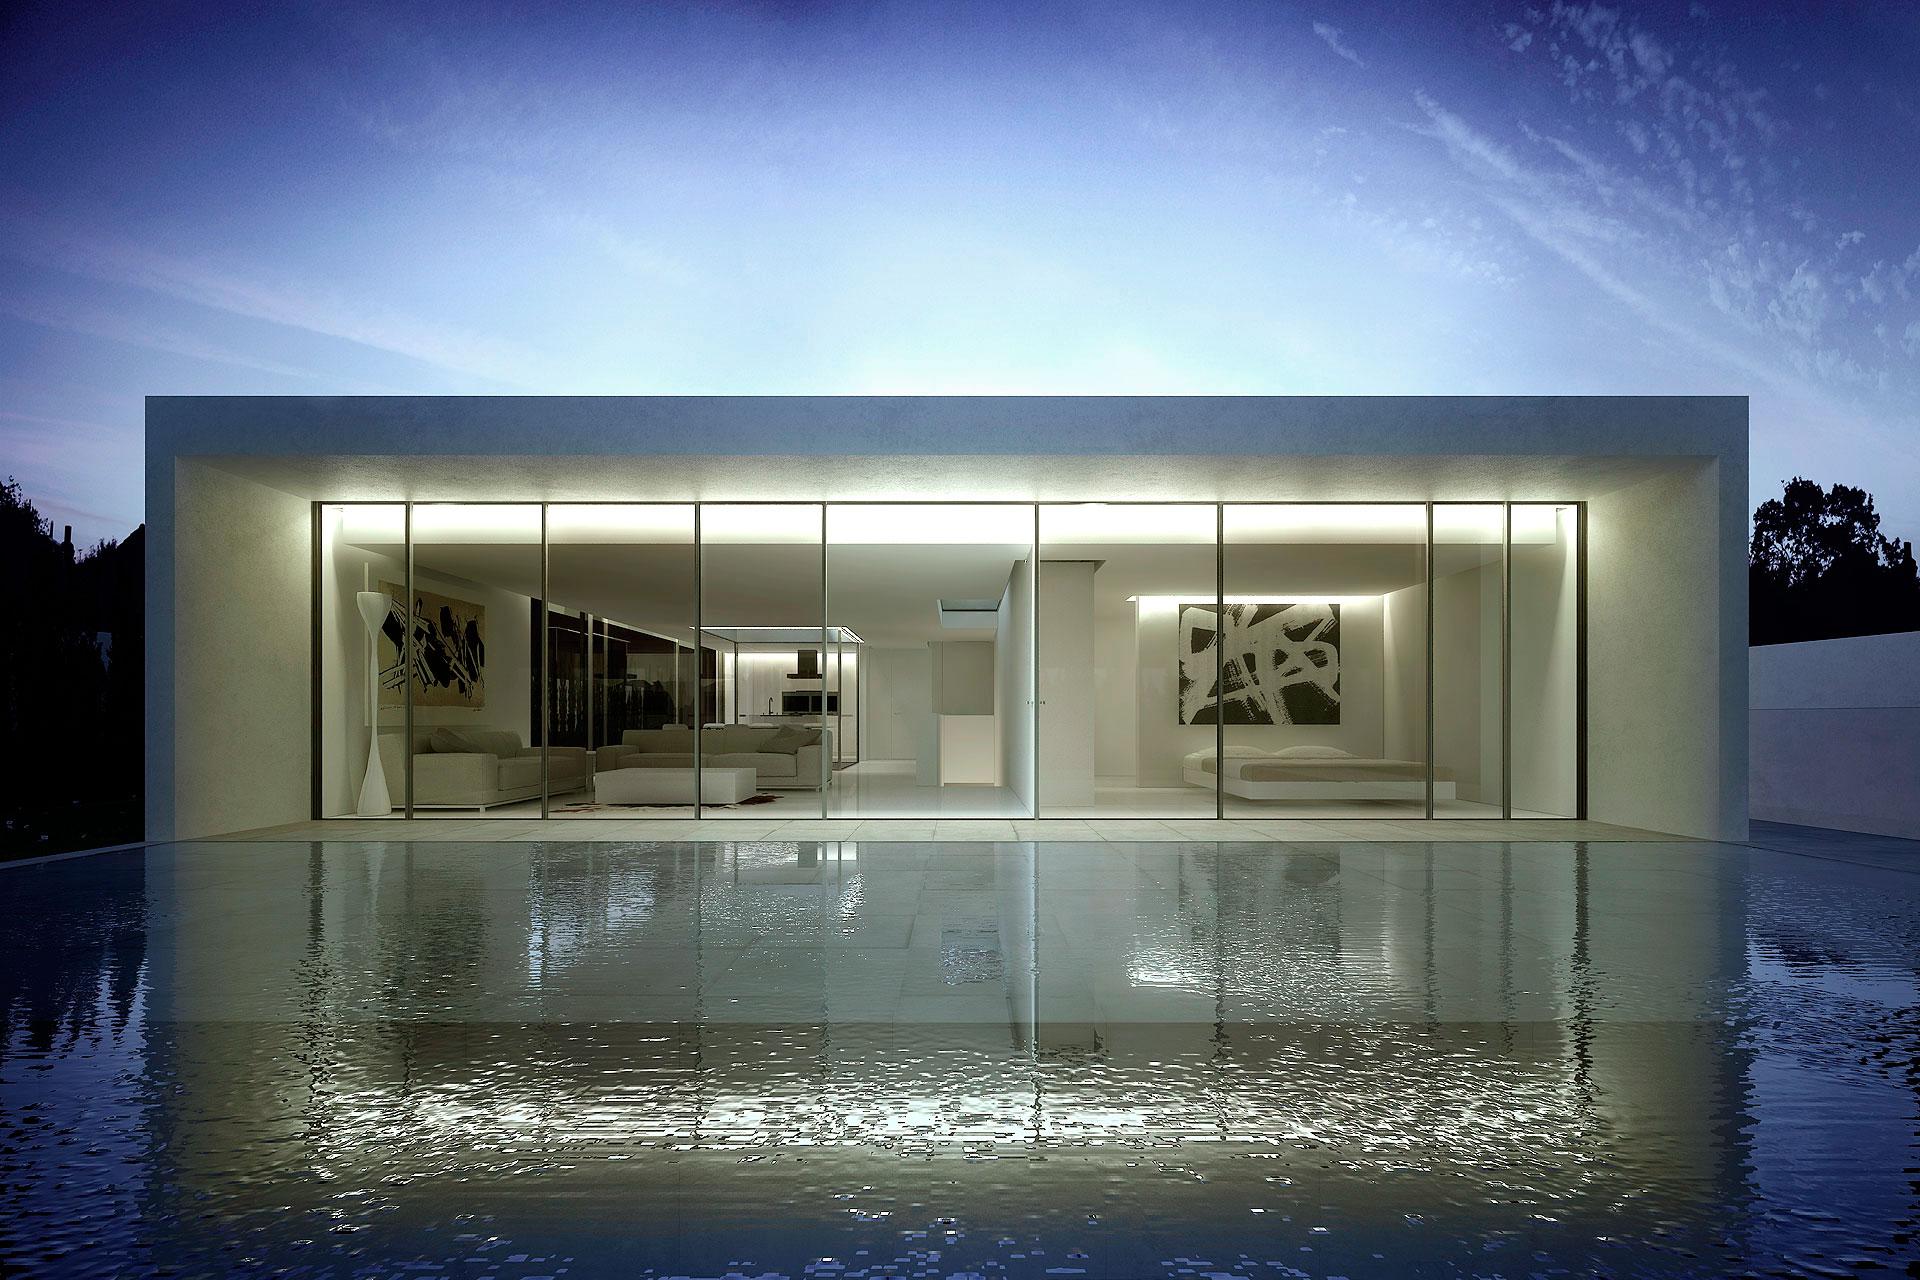 Tecnologia e arquitetura 3ve entrevista archdaily brasil for Infografia arquitectura